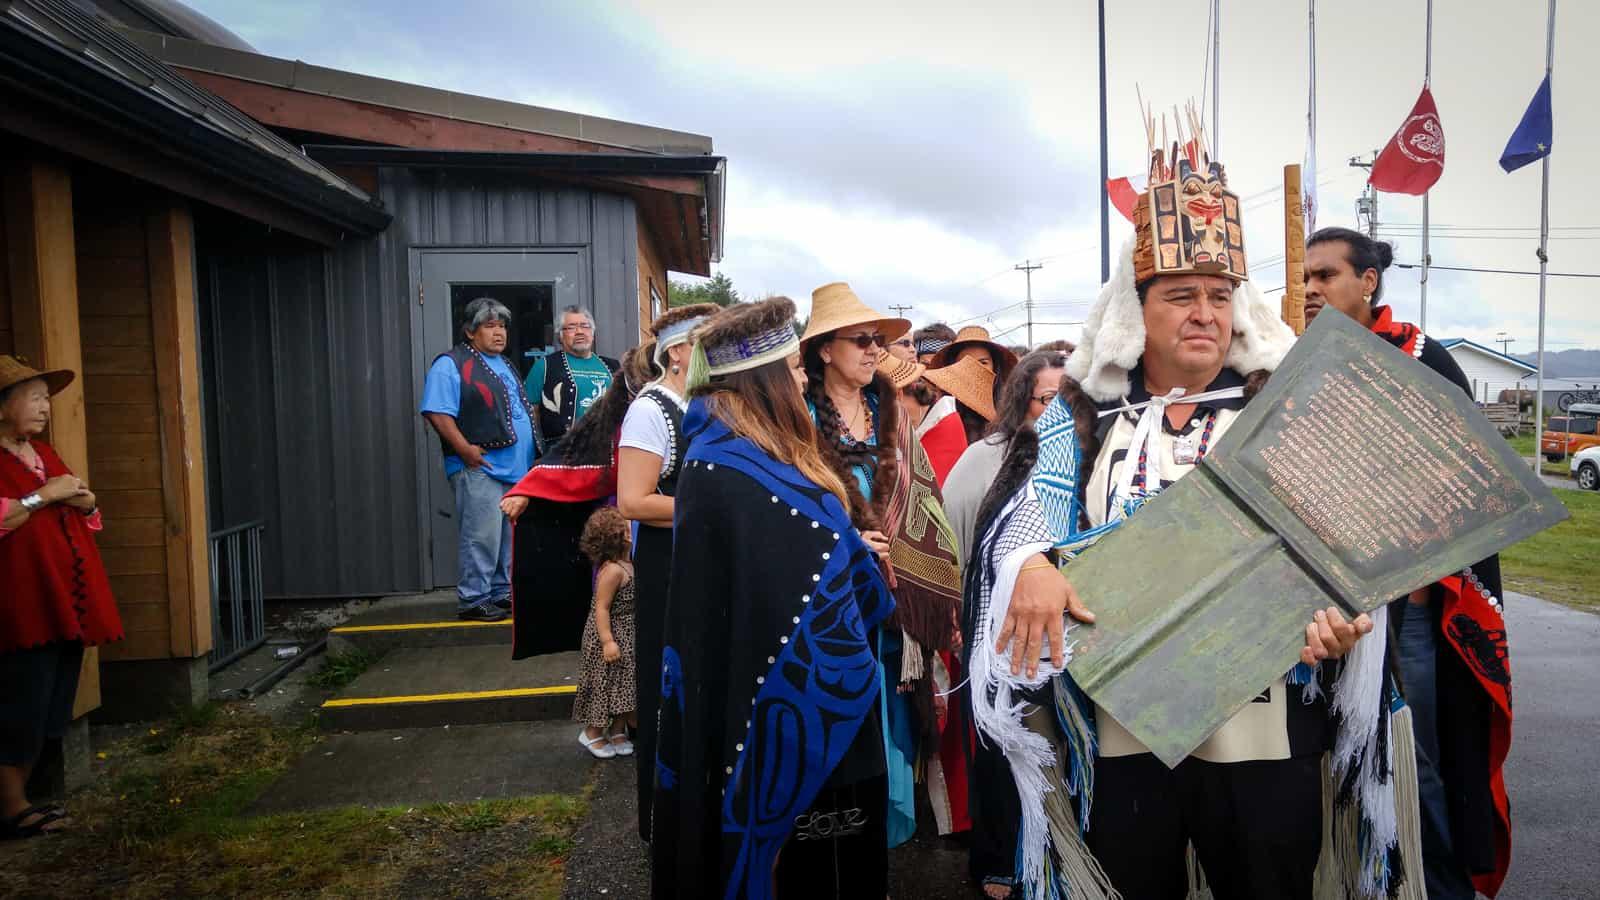 What made this Haida clan potlatch so historic?